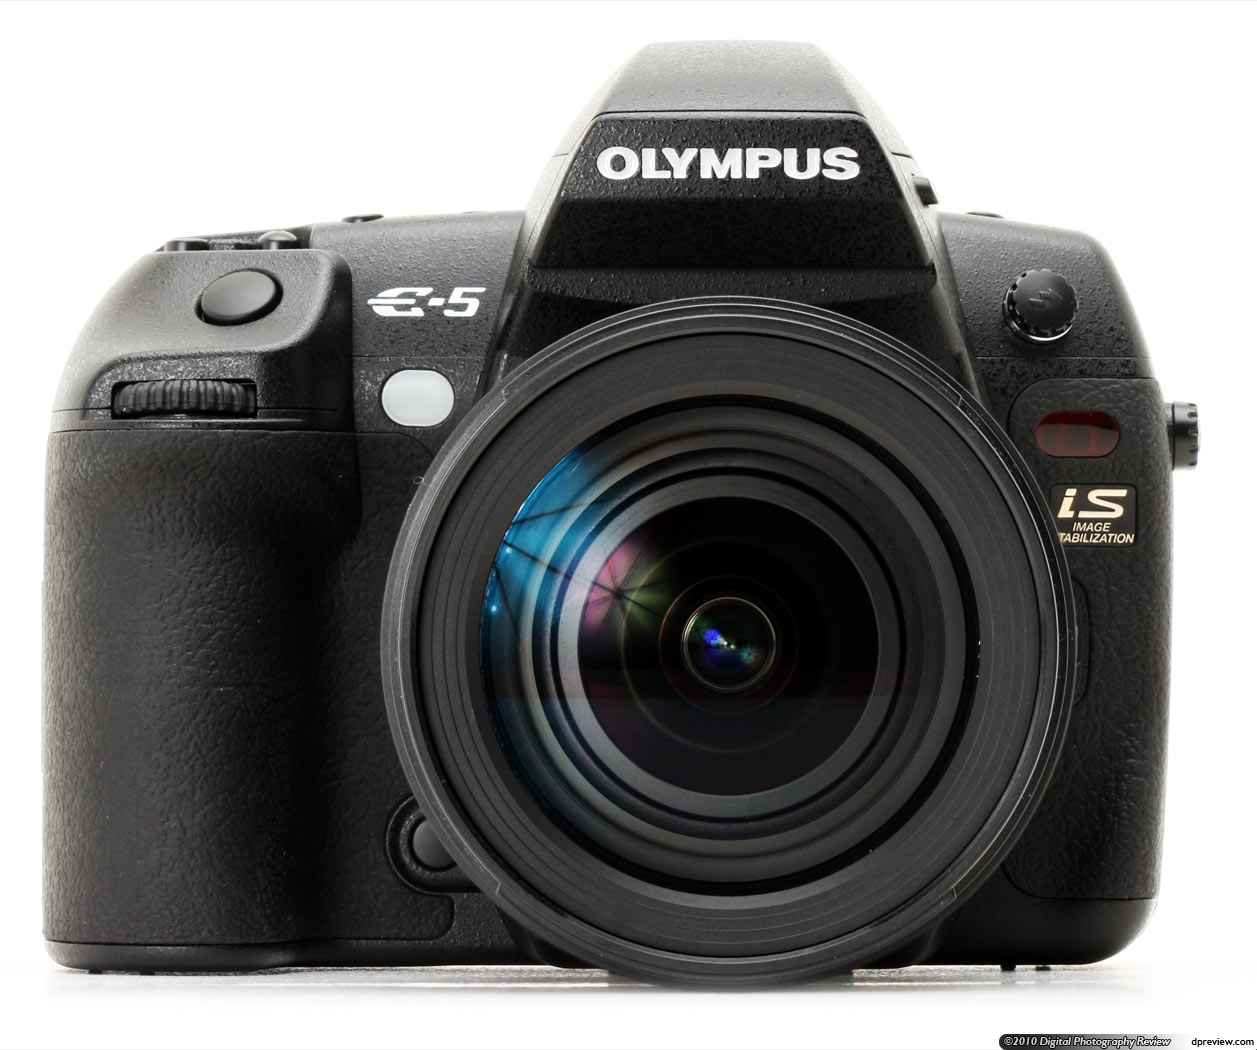 Olympus E-5 Camera